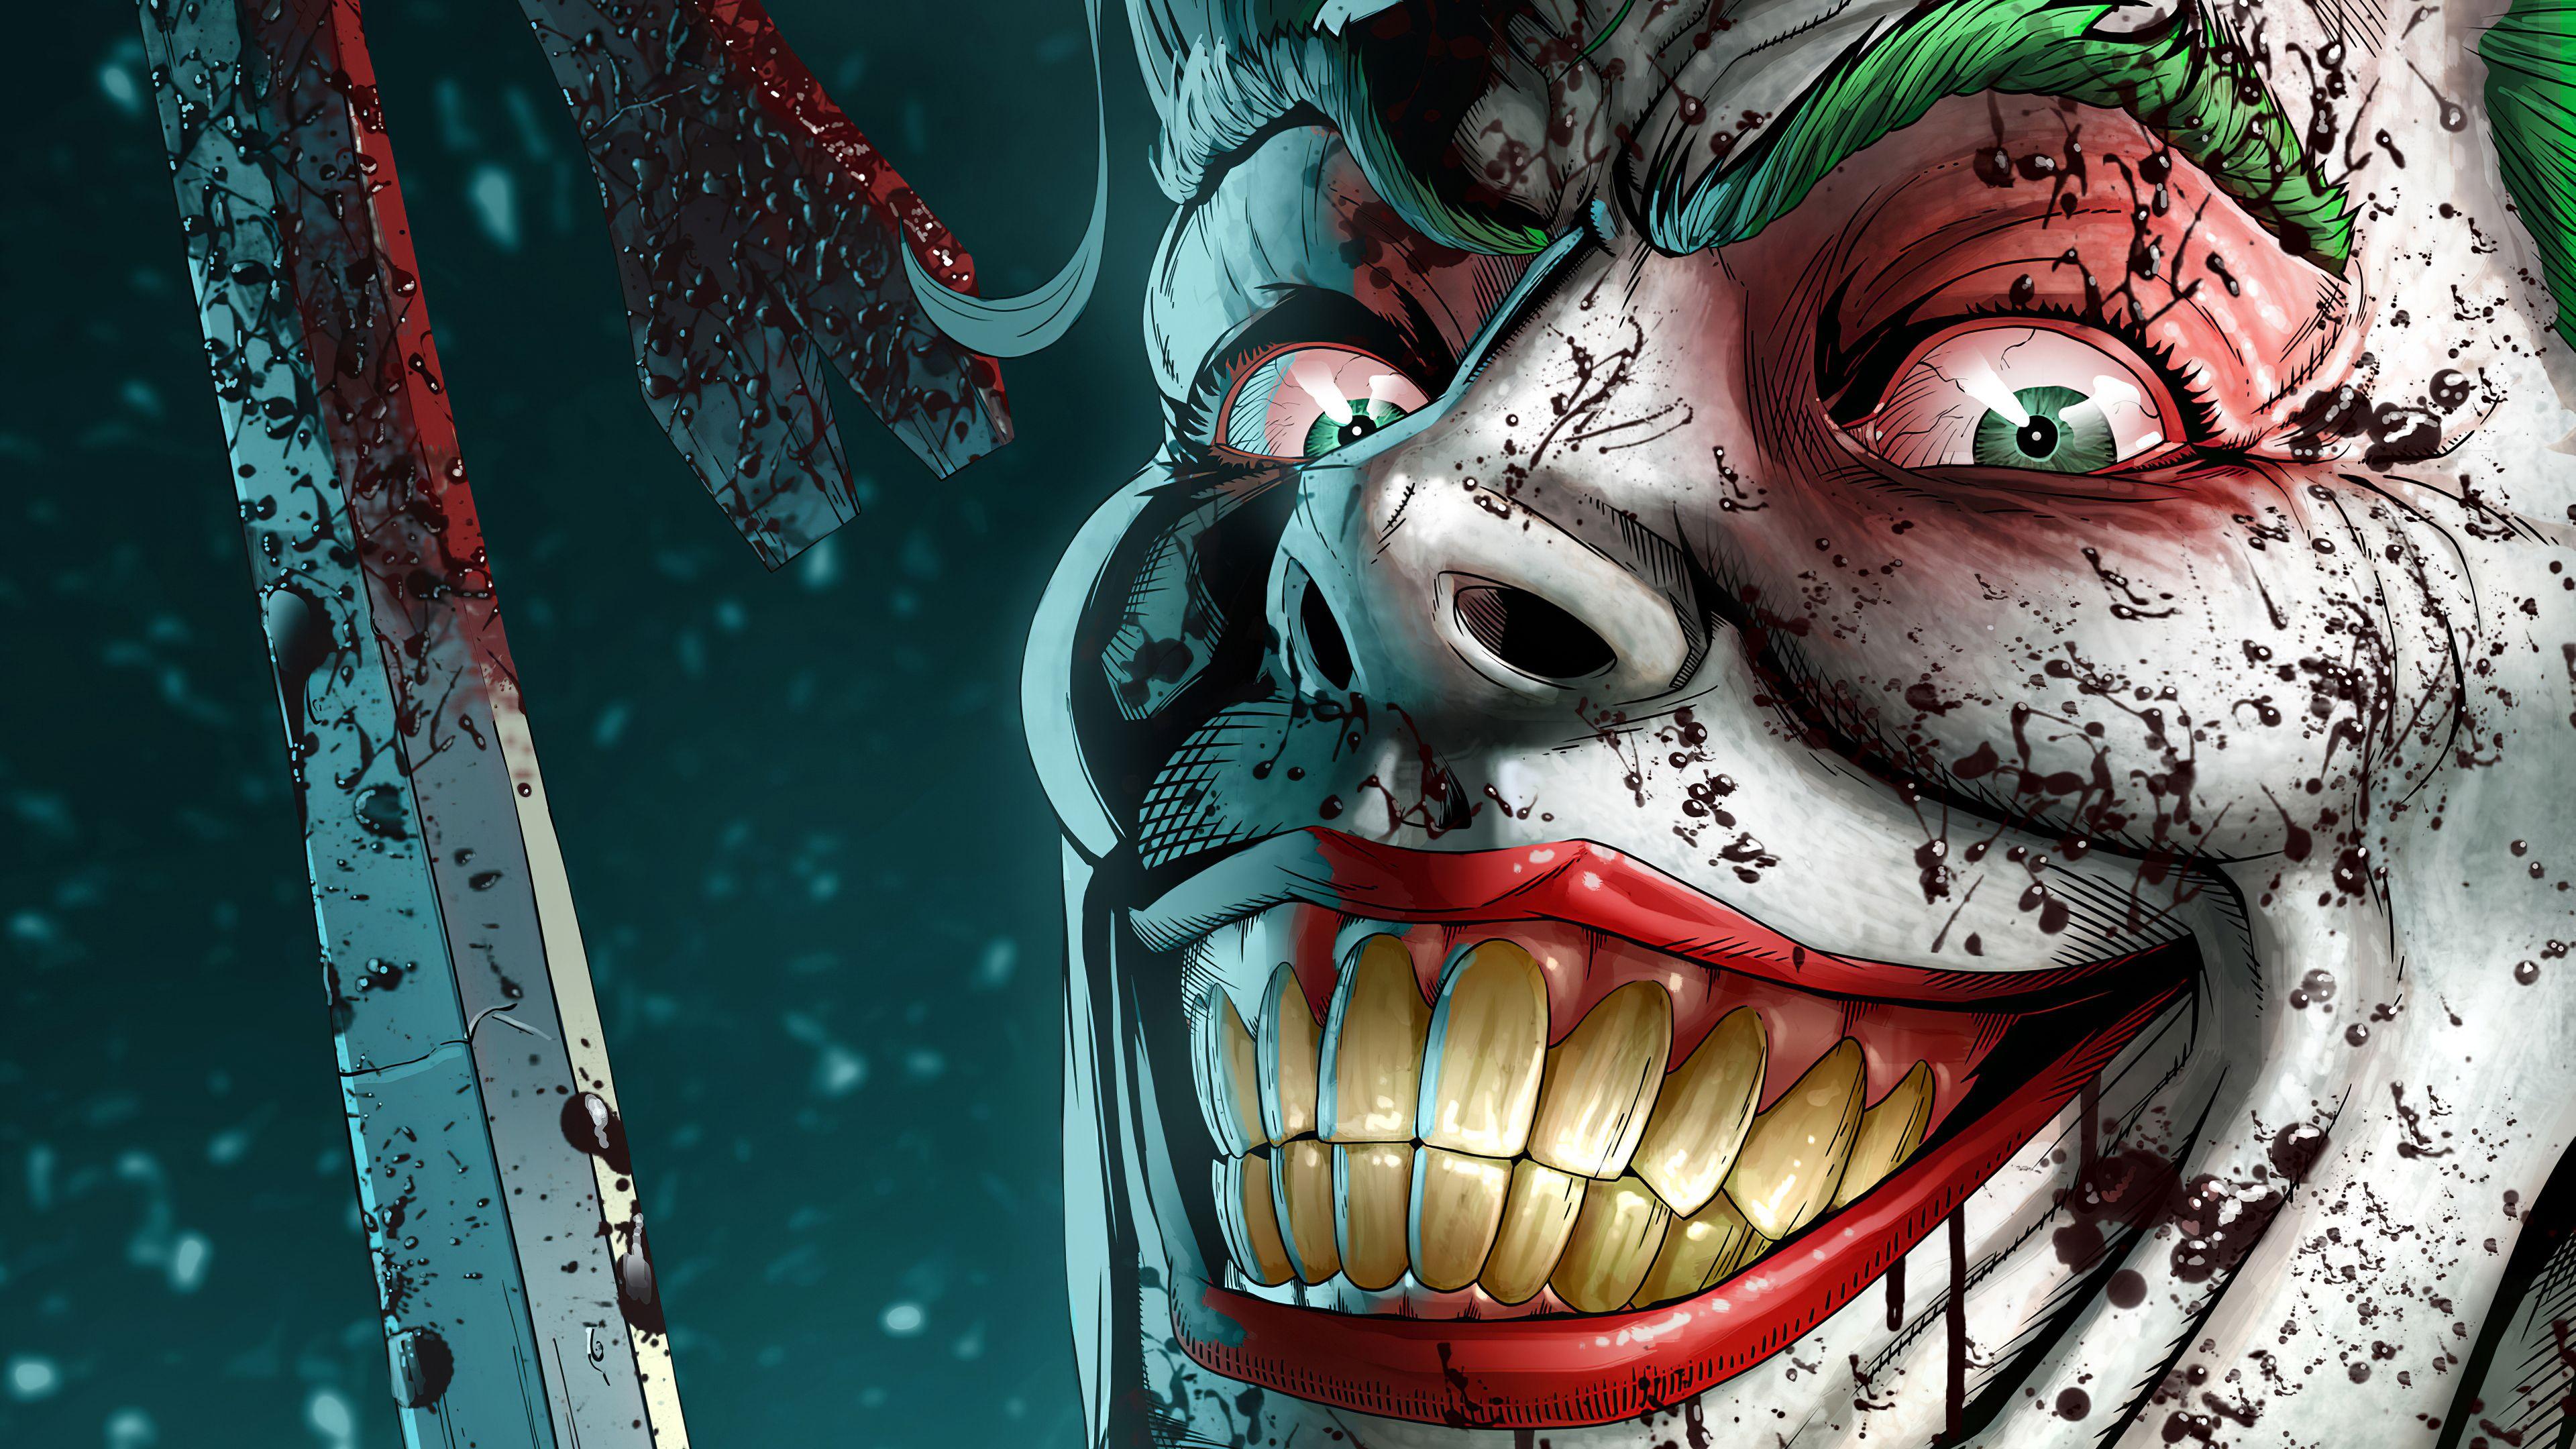 Joker Mouth Wallpapers - Wallpaper Cave